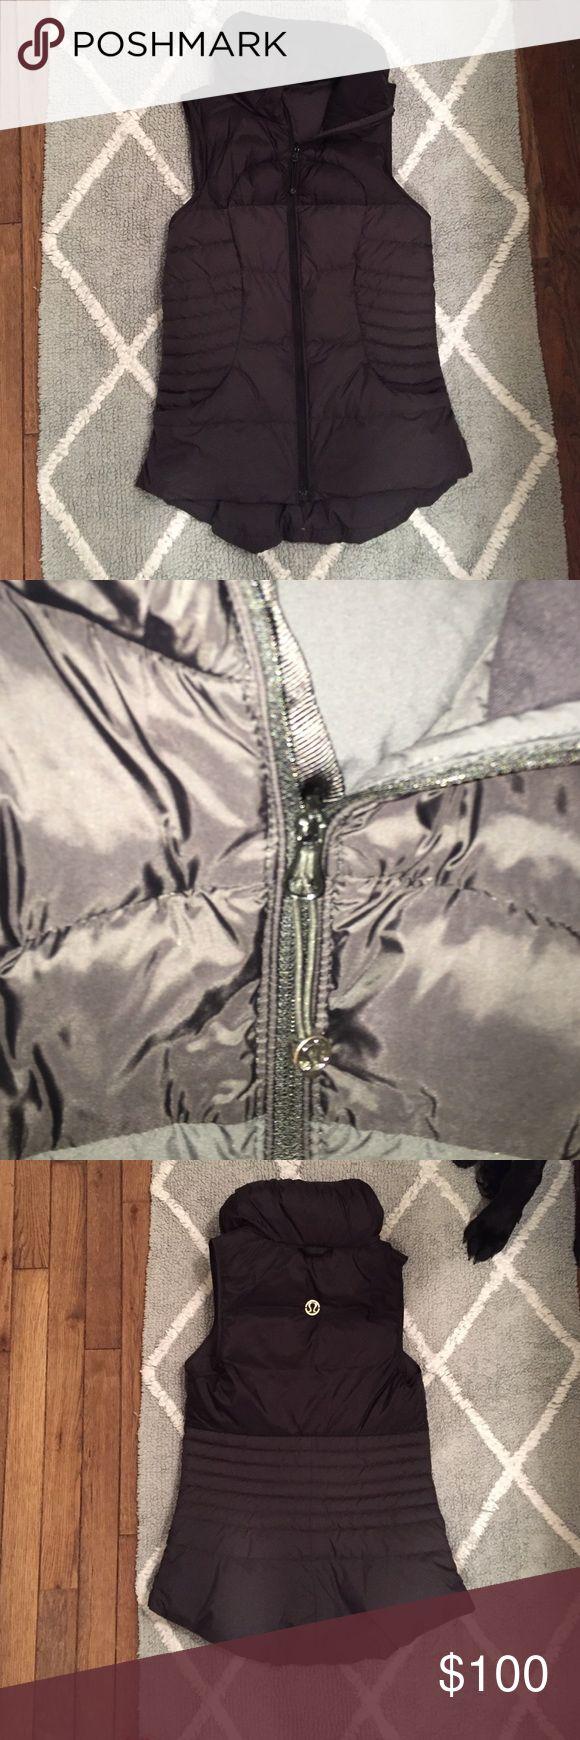 Lululemon vest size 6 EUC Lululemon vest size 6 EUC black lululemon athletica Jackets & Coats Vests